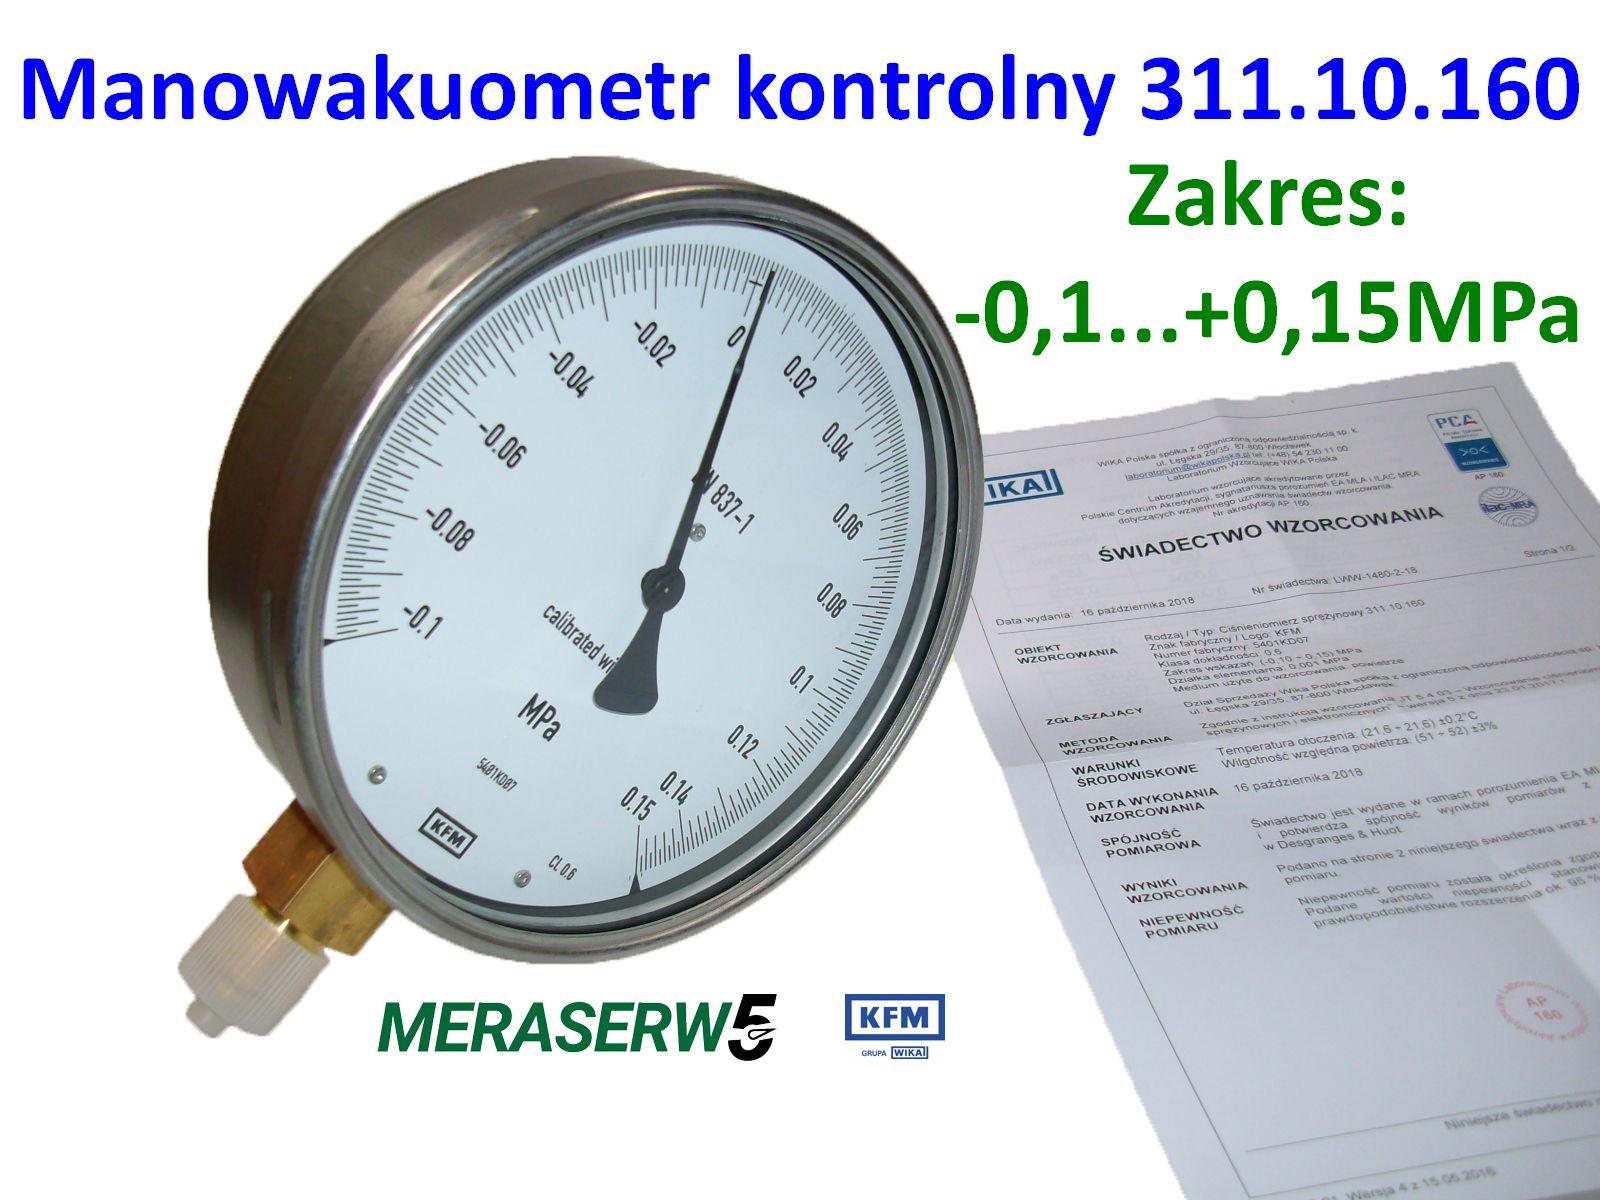 311.10 down 01015MPa